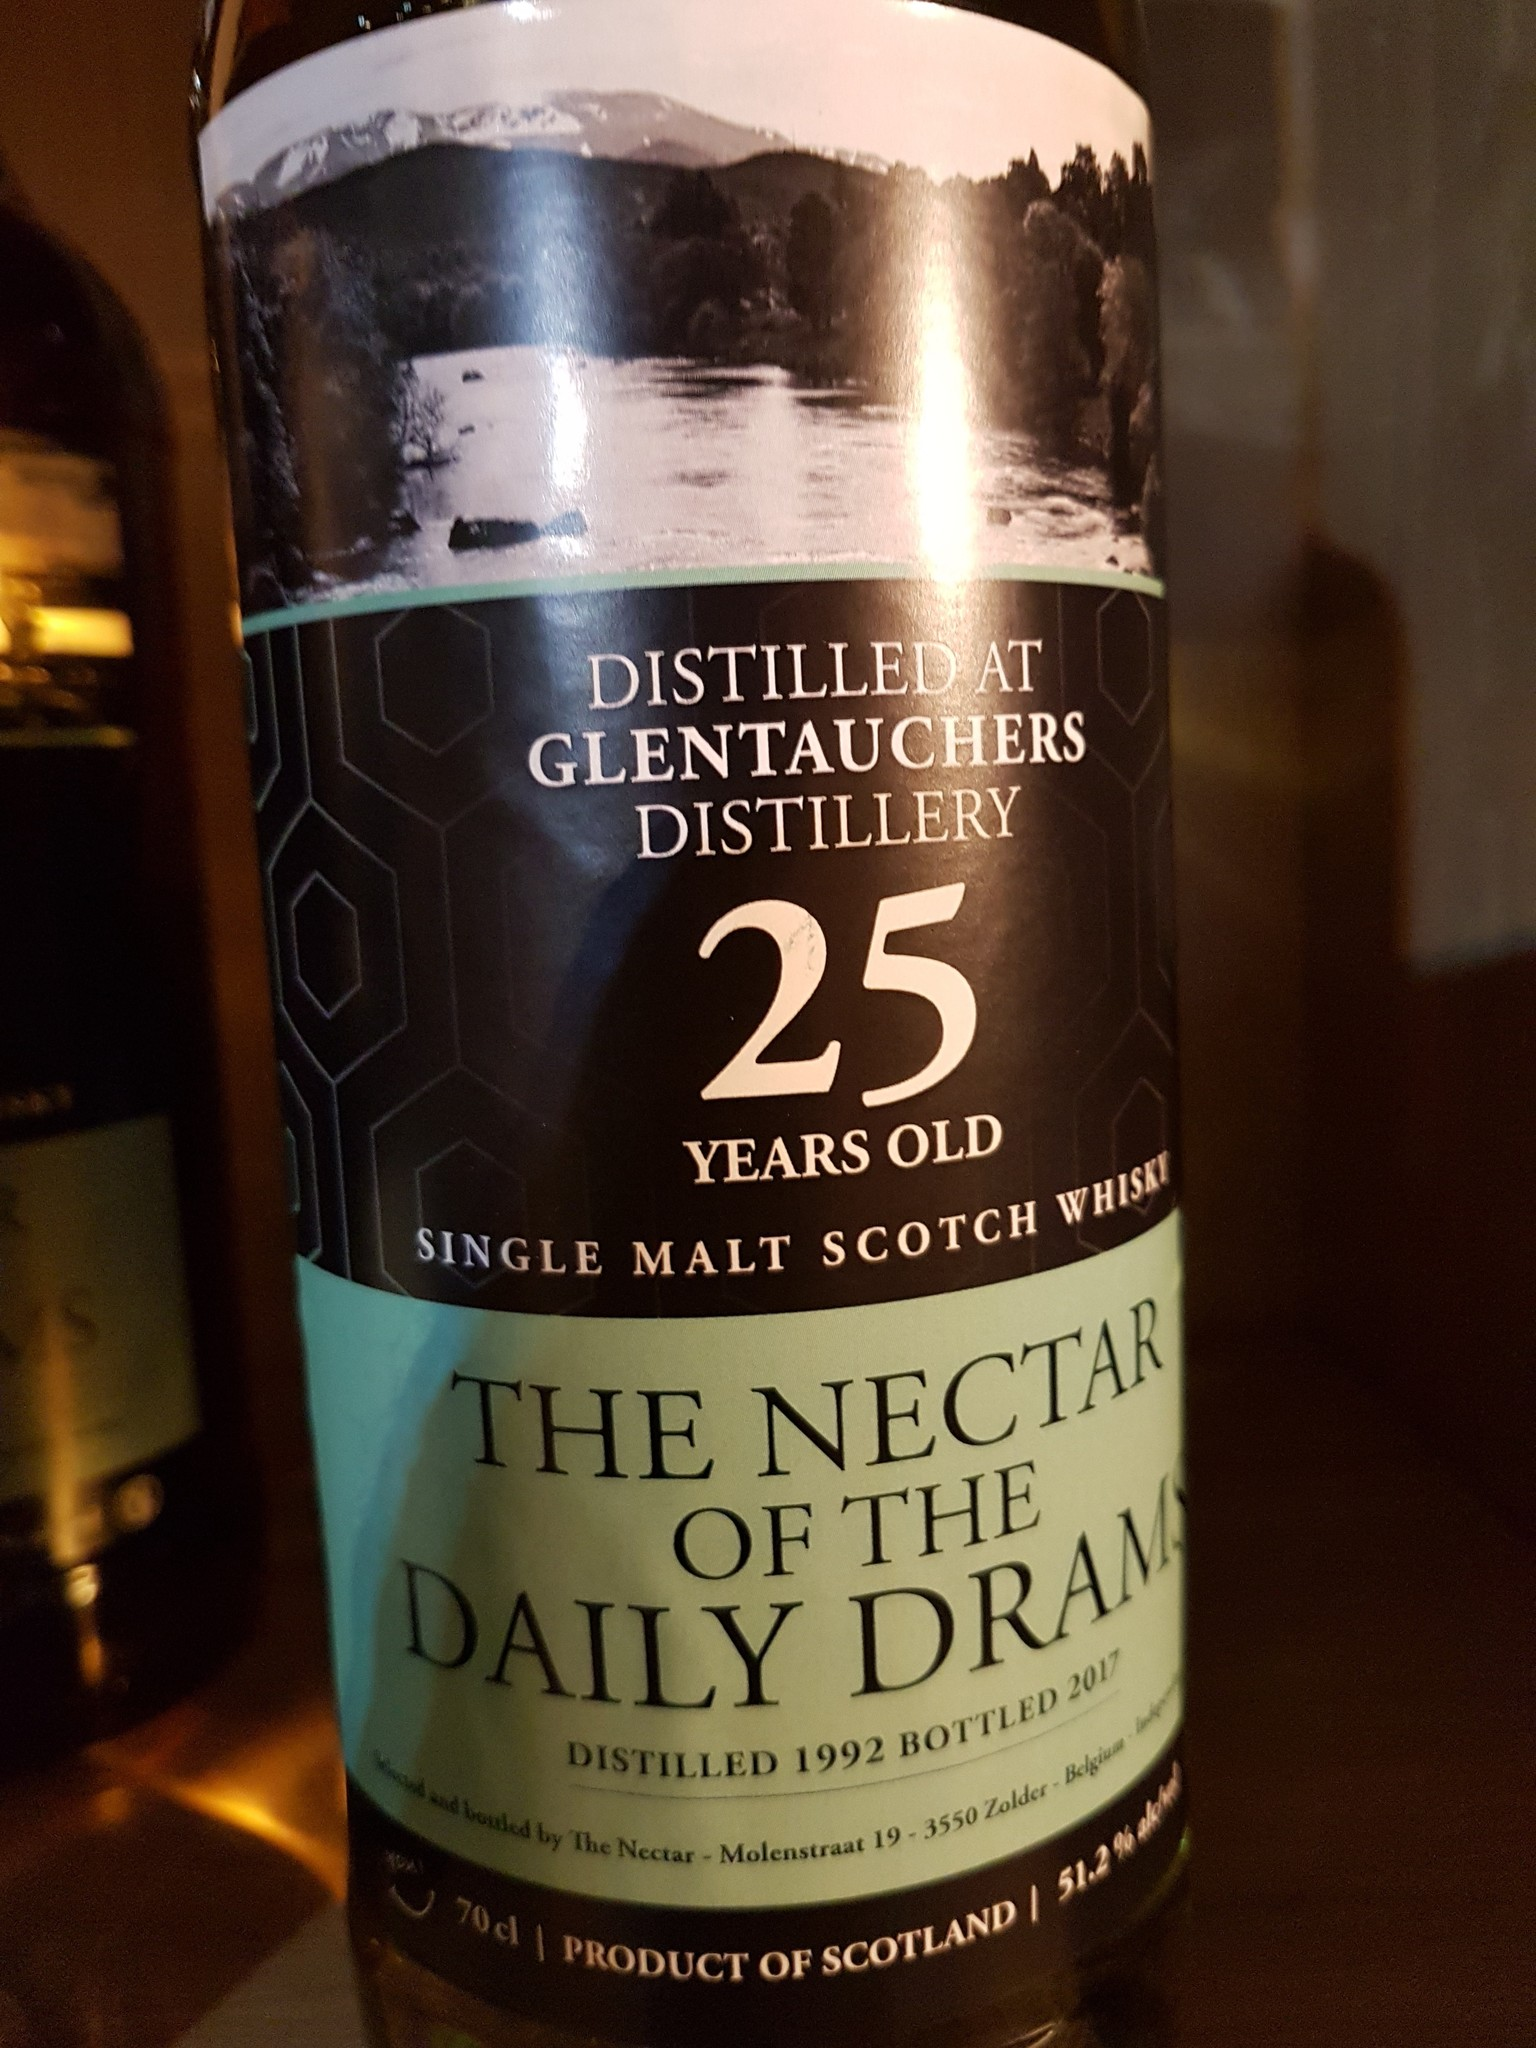 The nectar of the Daily drams Glentauchers 25Y 1992-2017 51.2%  Daily Dram